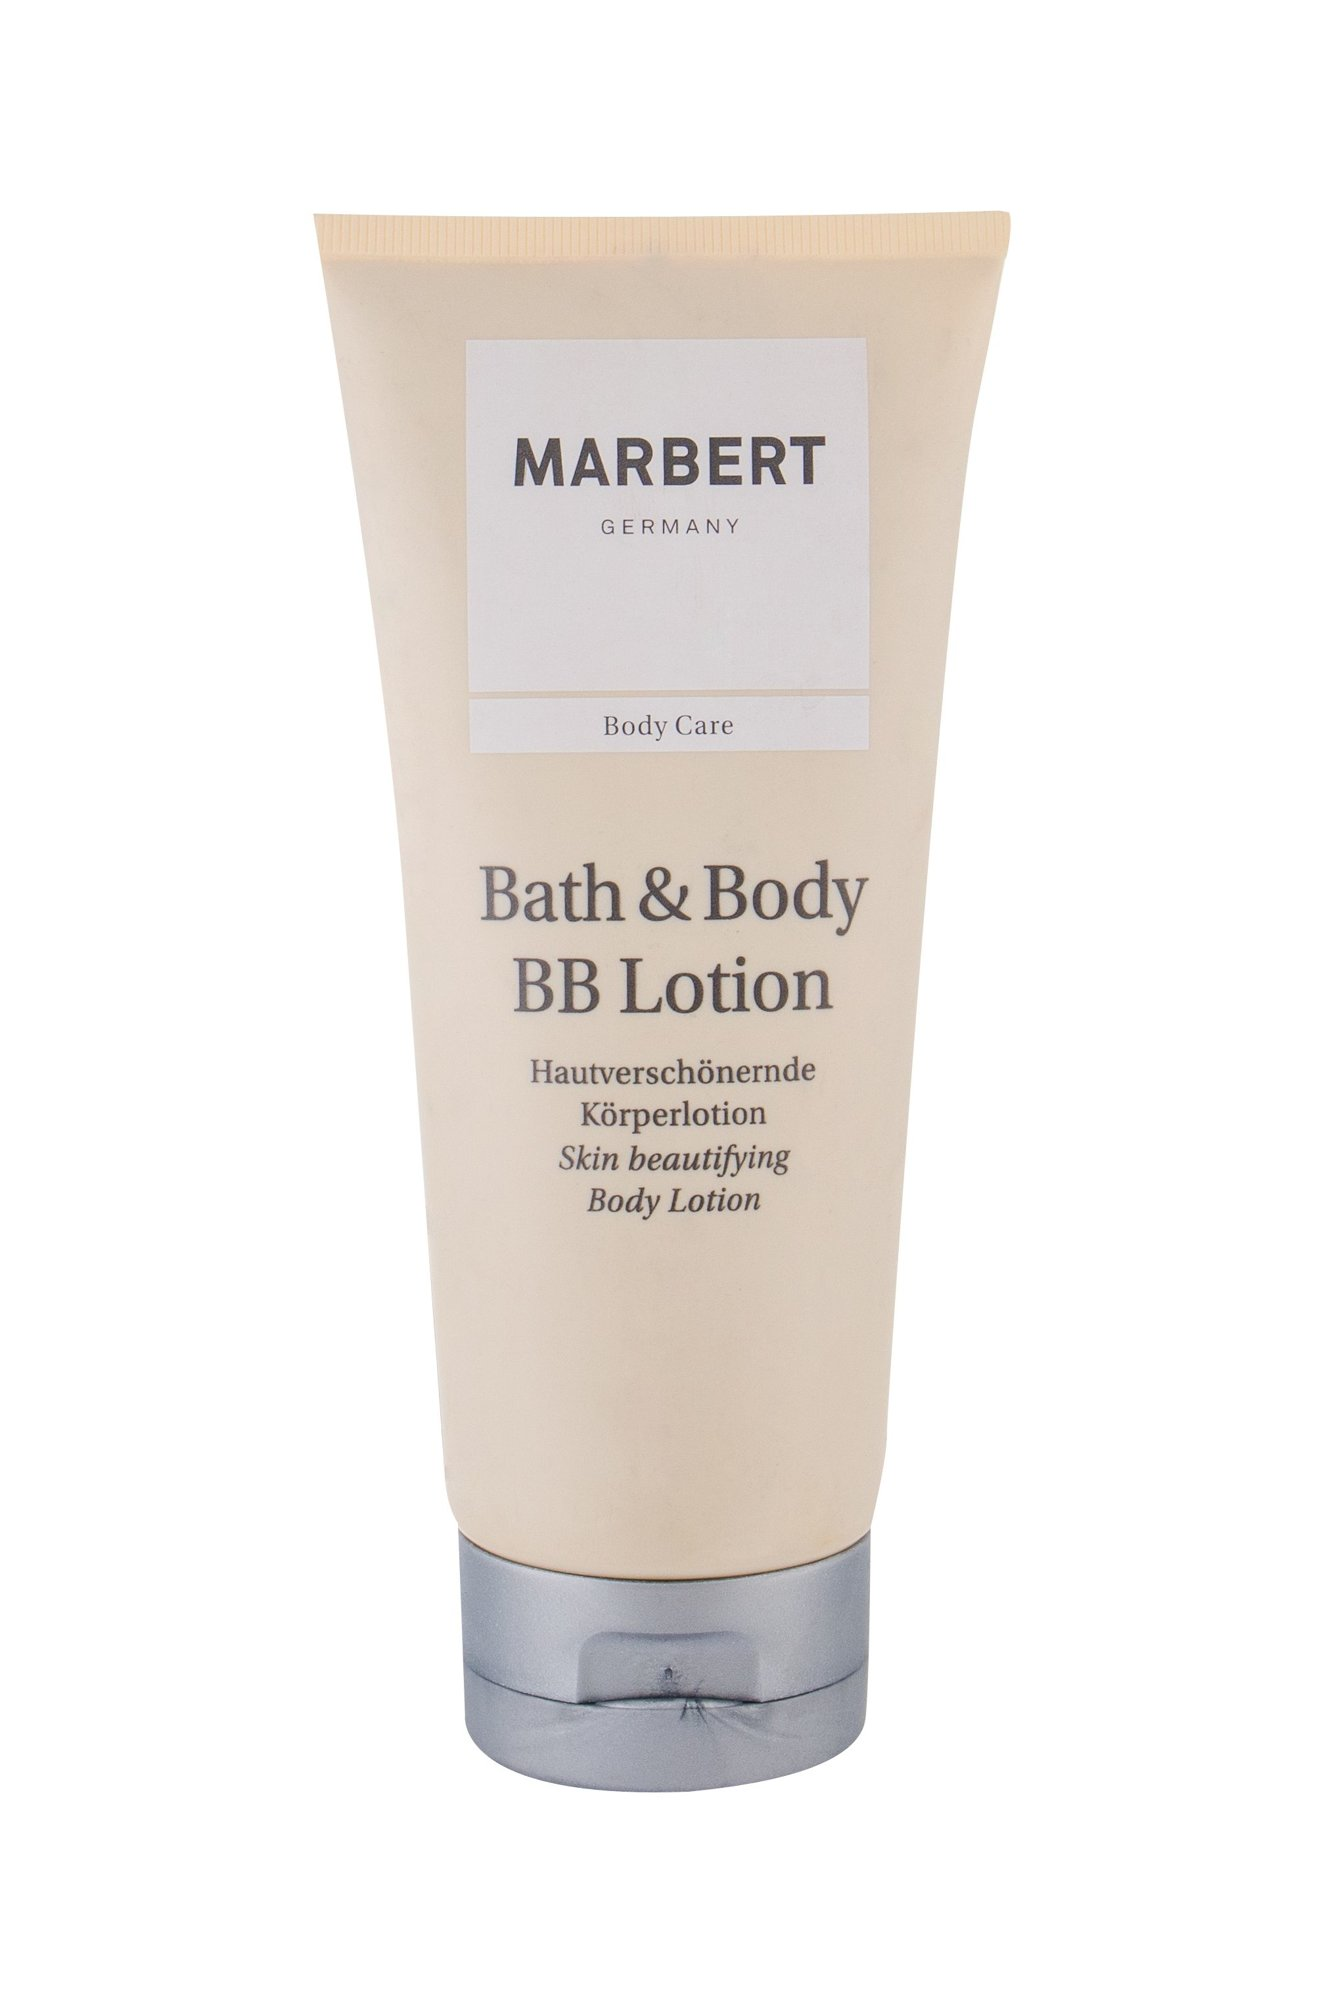 Marbert Bath & Body BB Body Lotion 200ml